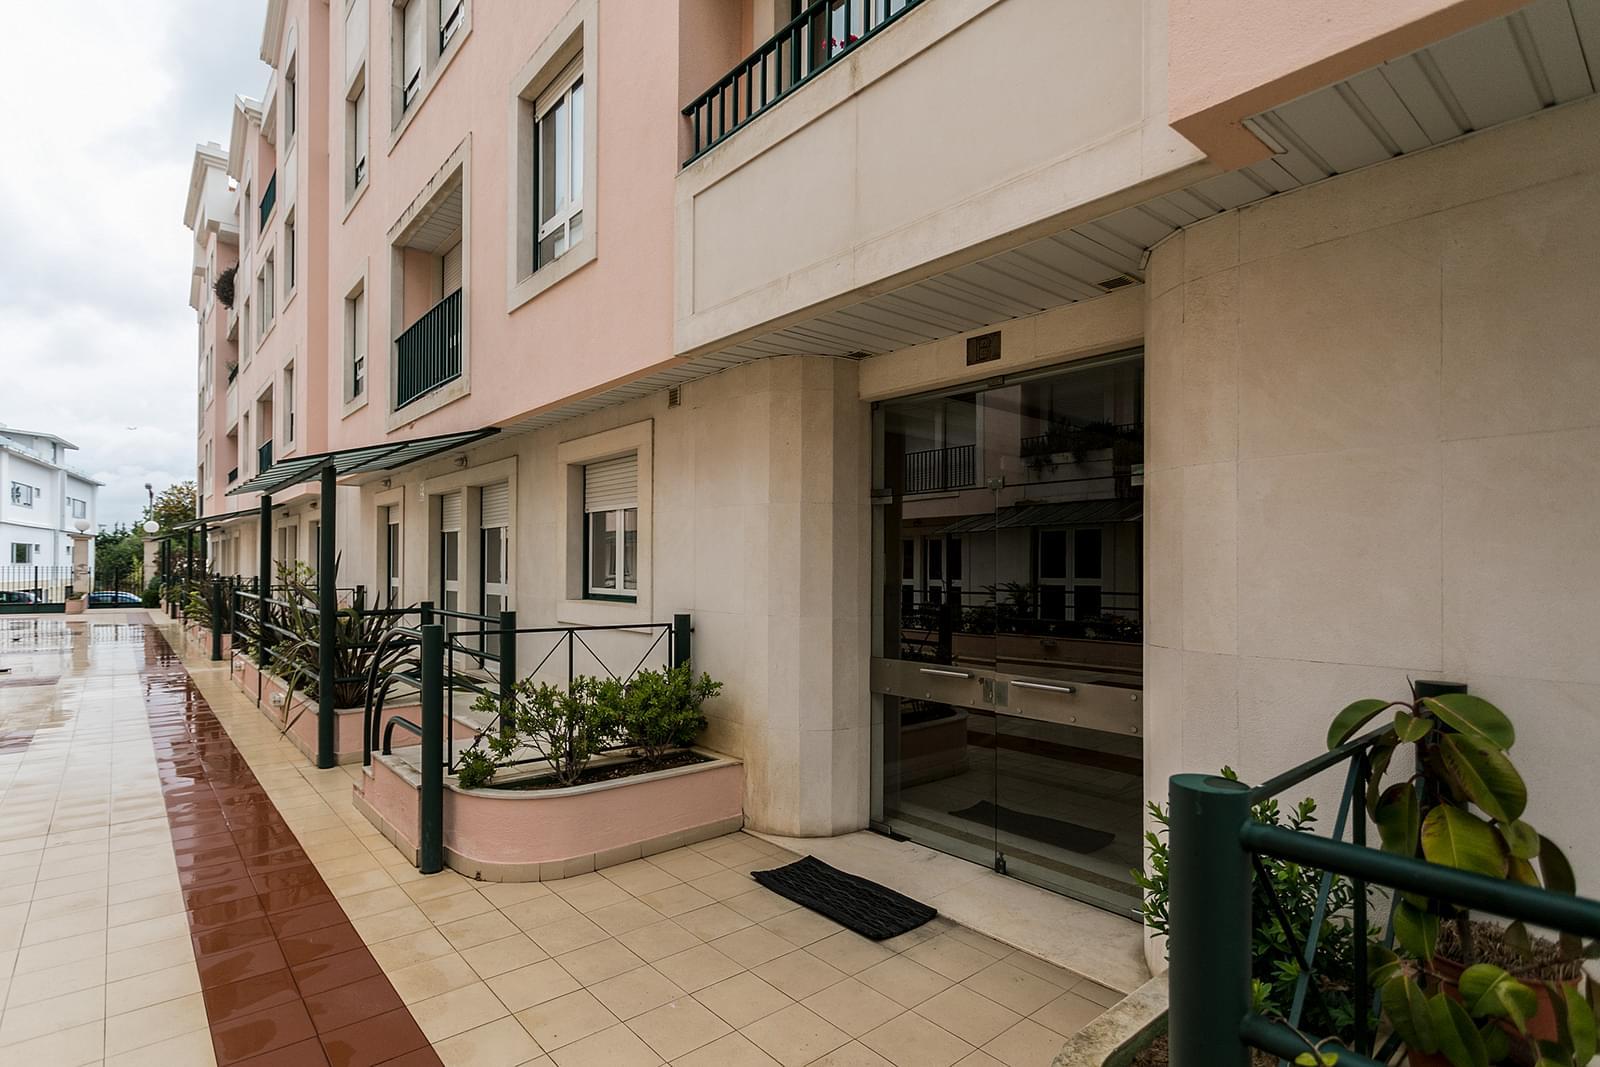 pf17352-apartamento-t3-lisboa-51464e71-15e9-4021-8903-57c9b2967497